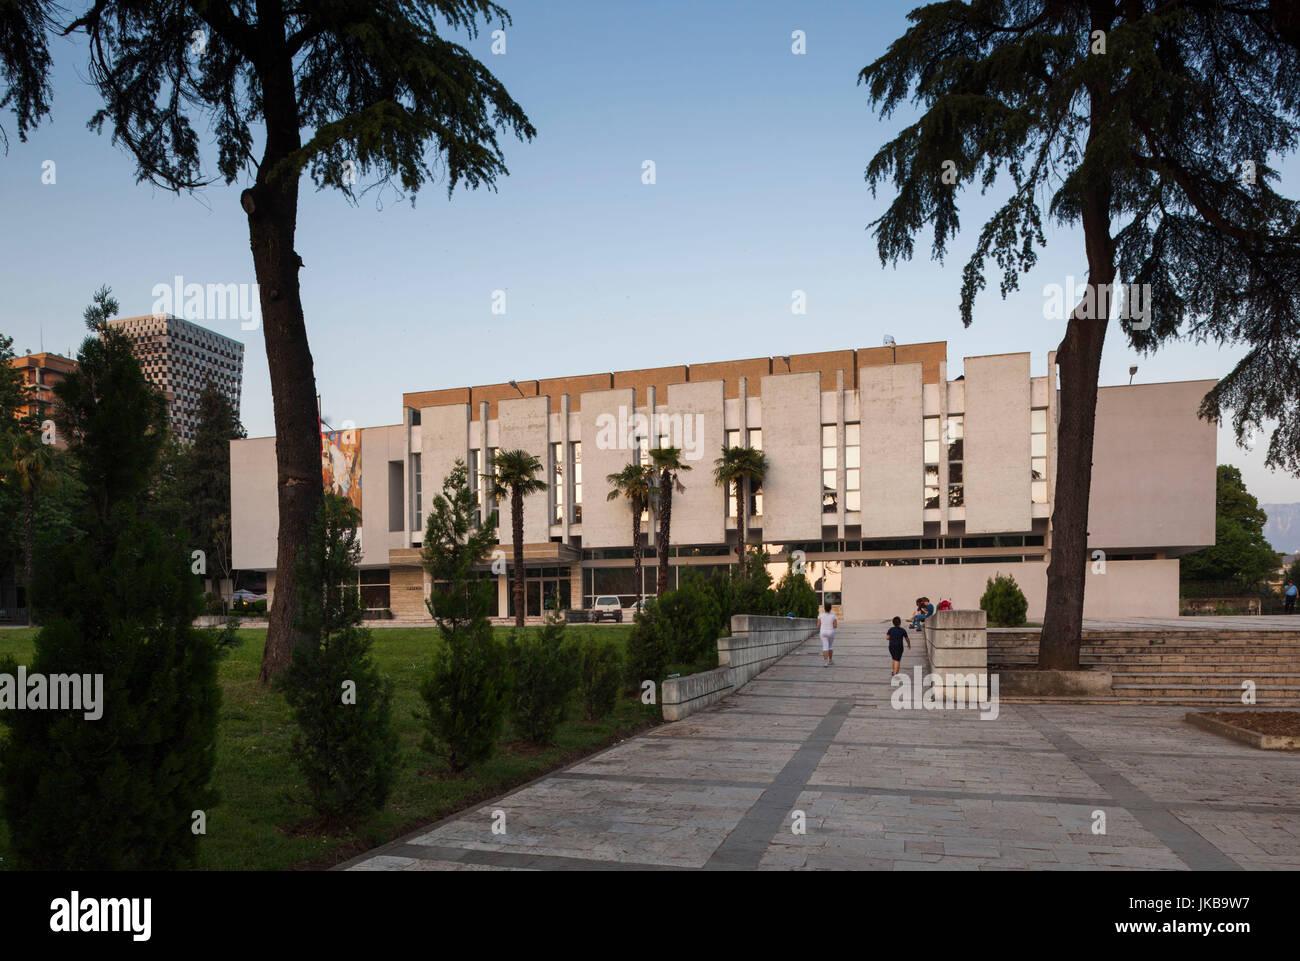 Albania, Tirana, National Art Gallery - Stock Image